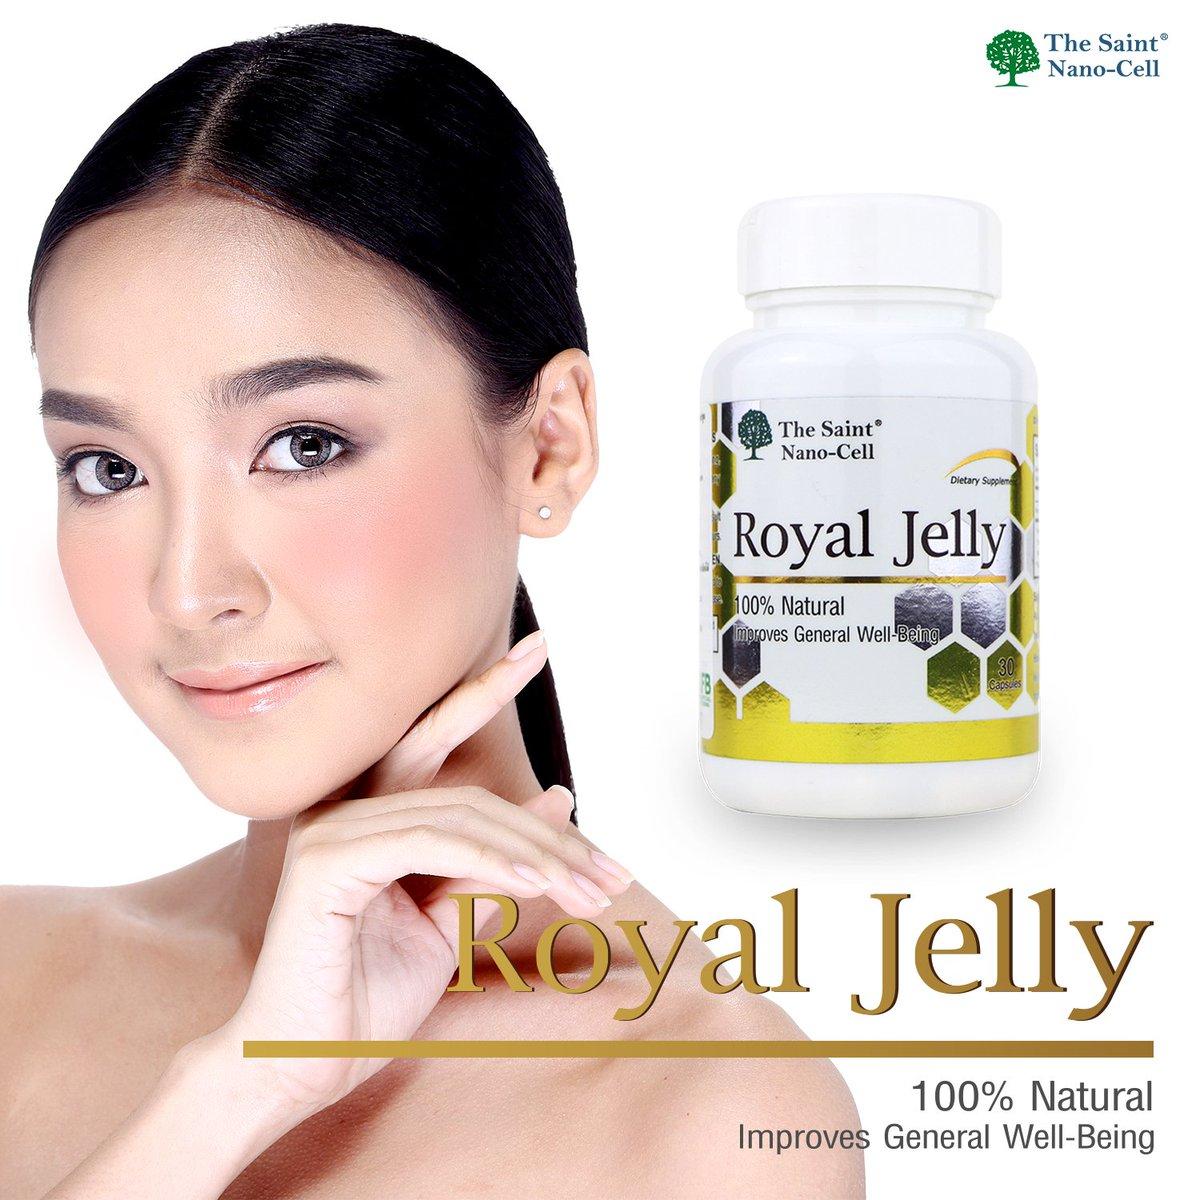 TheSaint Royal Jelly  #TheSaint #RoyalJelly #เดอะเซนต์ #โรยัลเจลลี่ #นมผึ้ง #ยี่ห้อไหนดี #ที่สุด #พันทิป #รีวิว #สุขภาพ #ผิวสวย #บำรุง<br>http://pic.twitter.com/qq9ElWFKSO